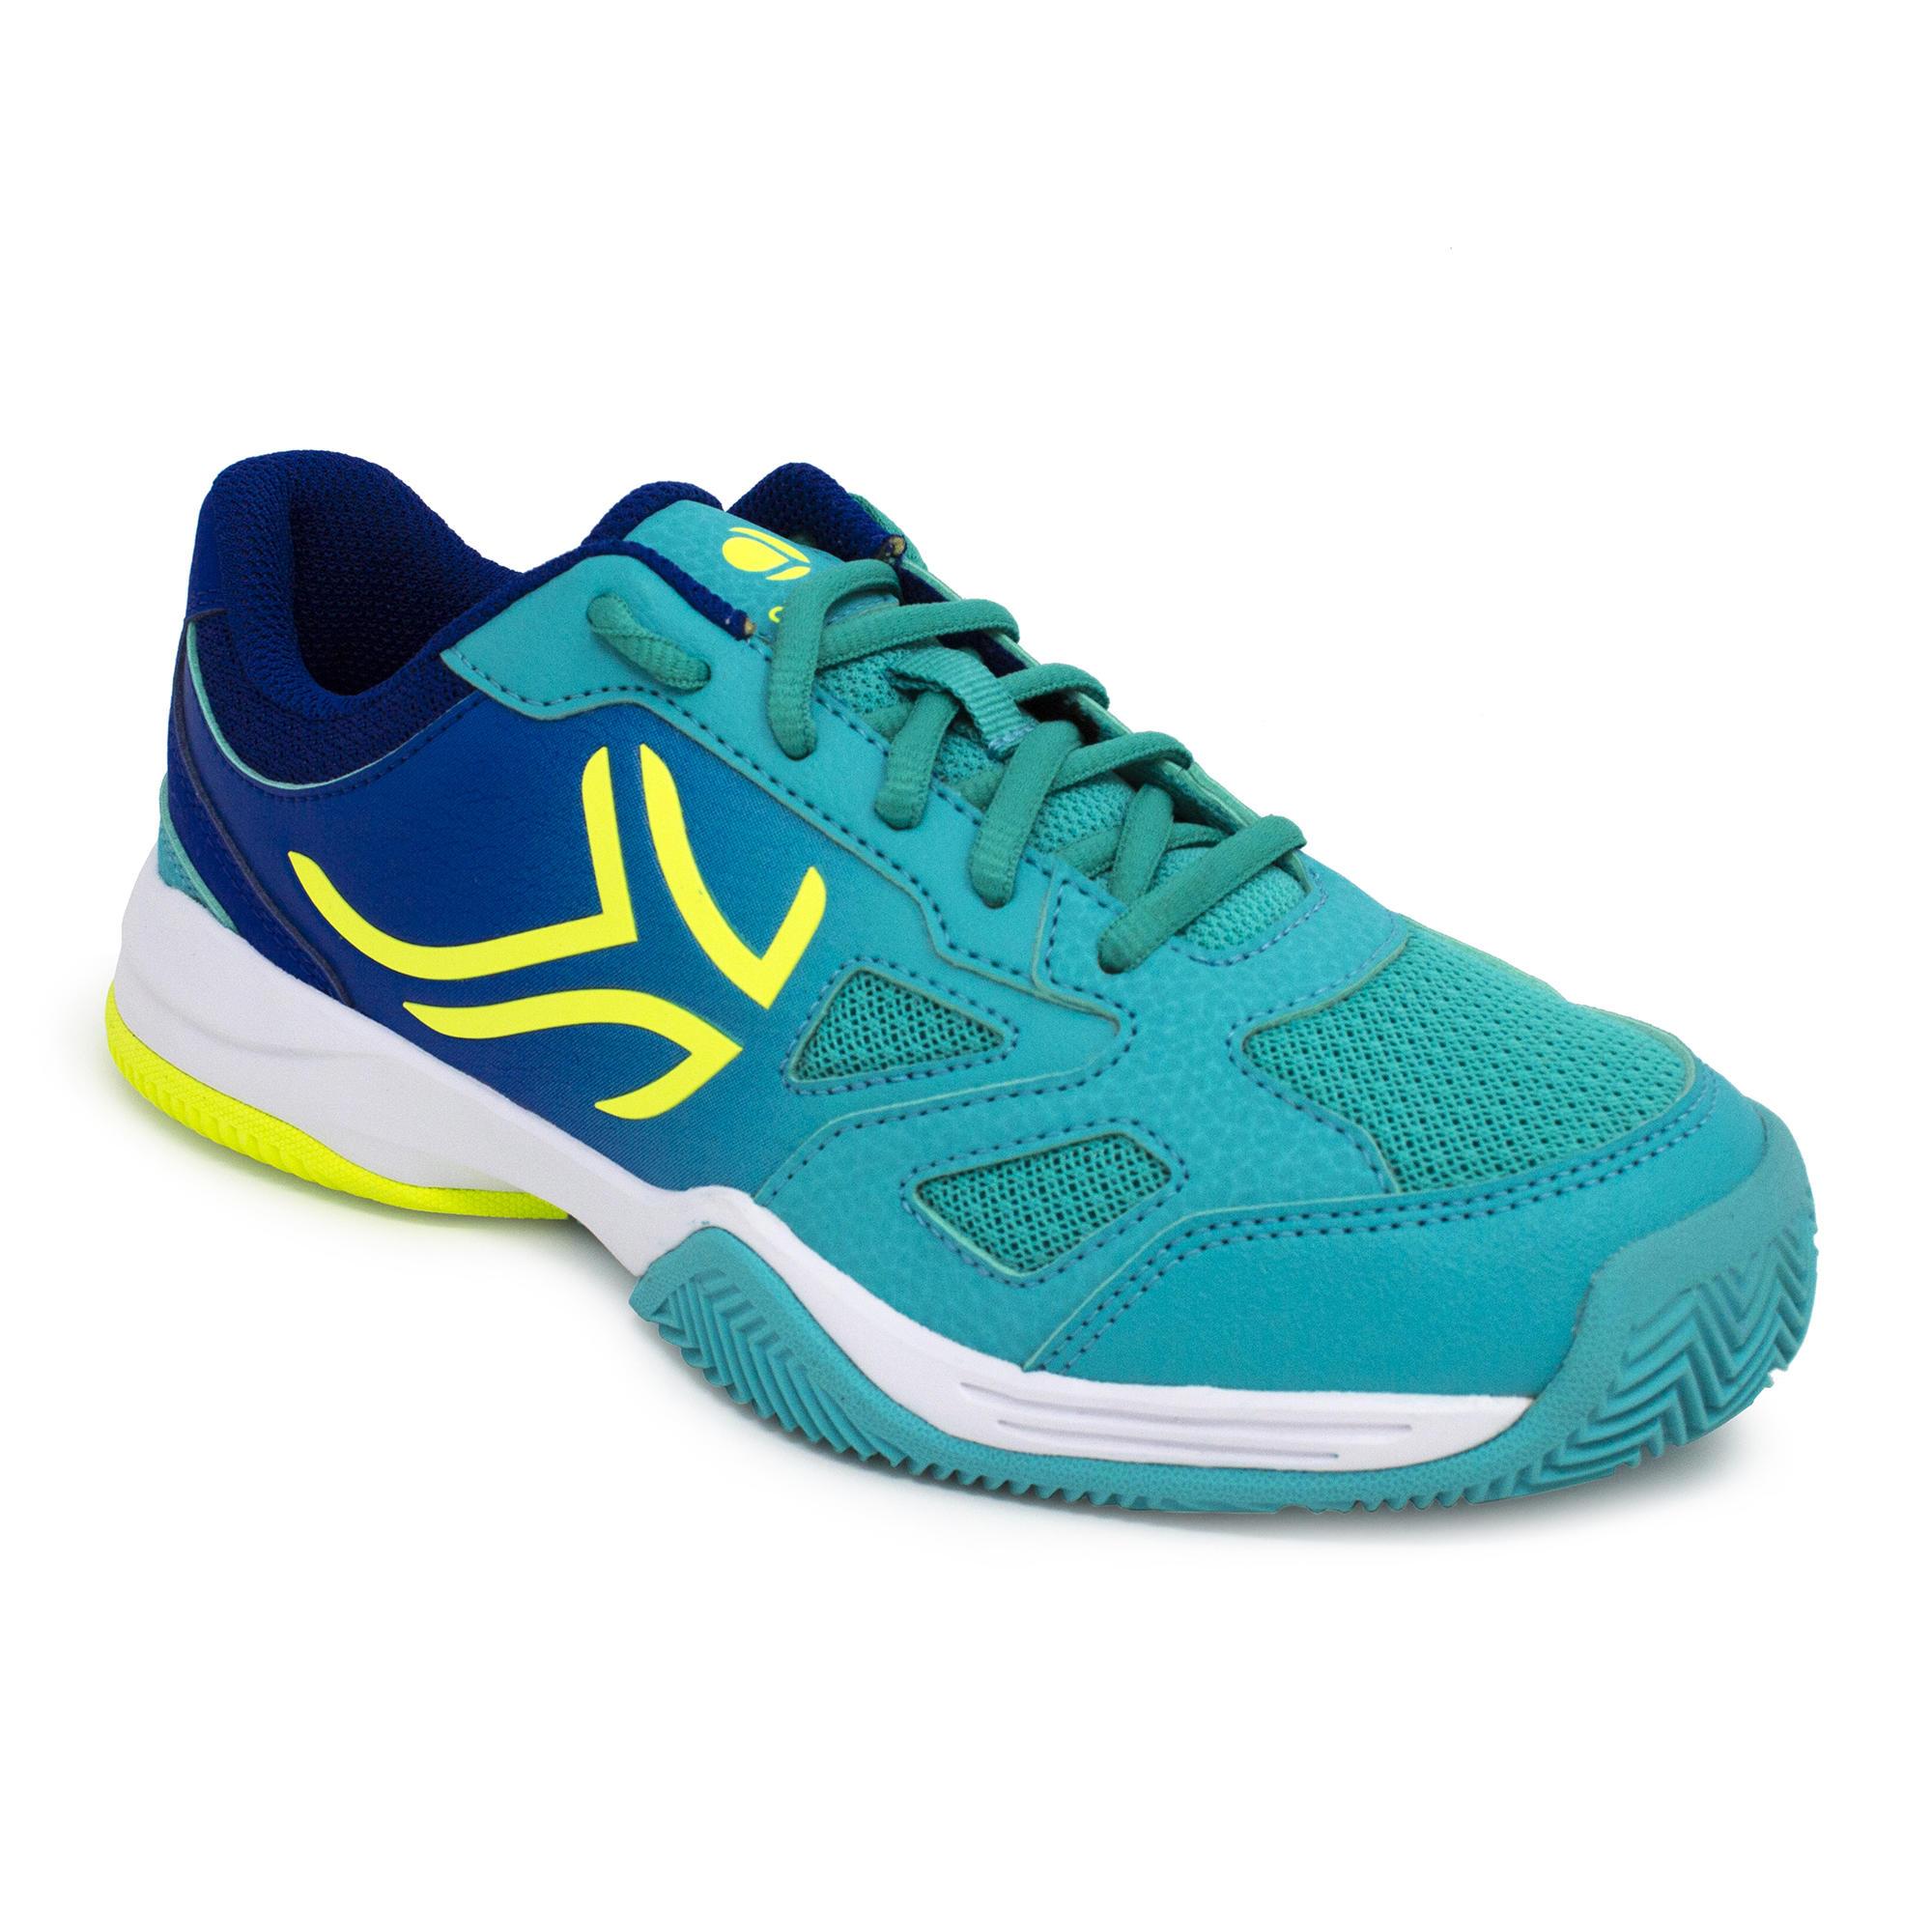 artengo scarpe padel junior ps 560 azzurre